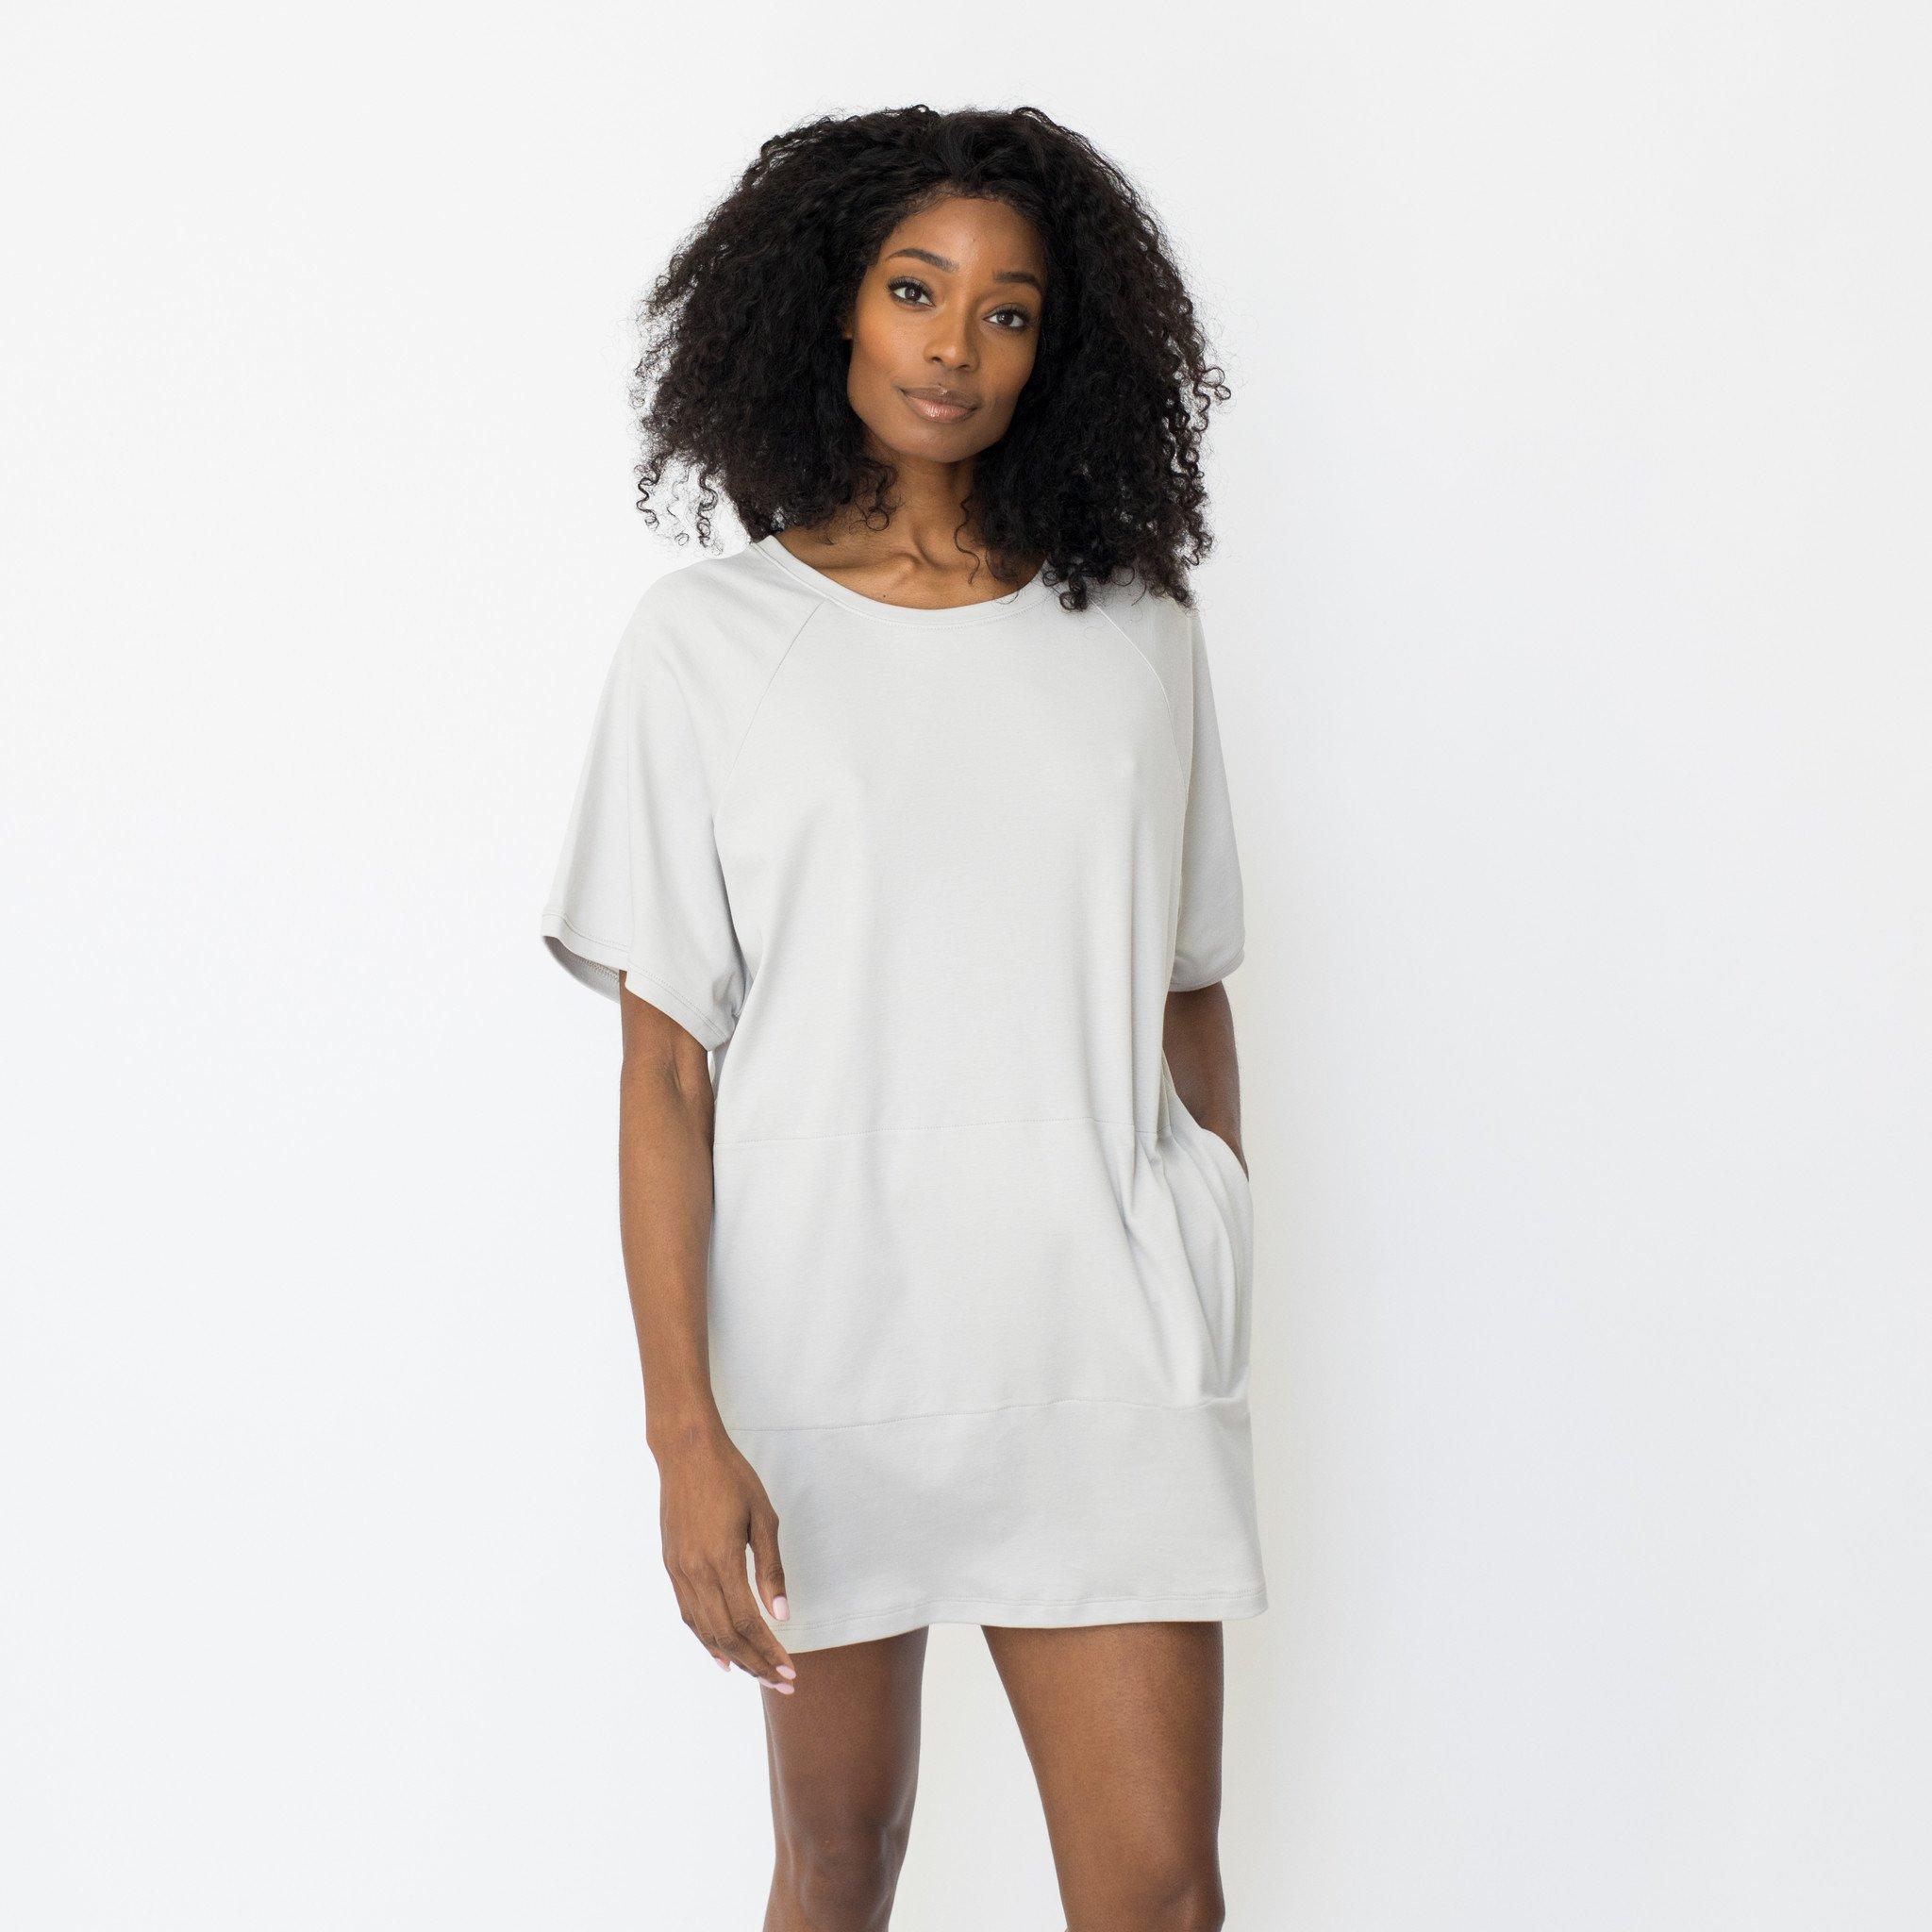 Long Sleep Shirts Womens Sleepwear - BCD Tofu House 3be20b6b5